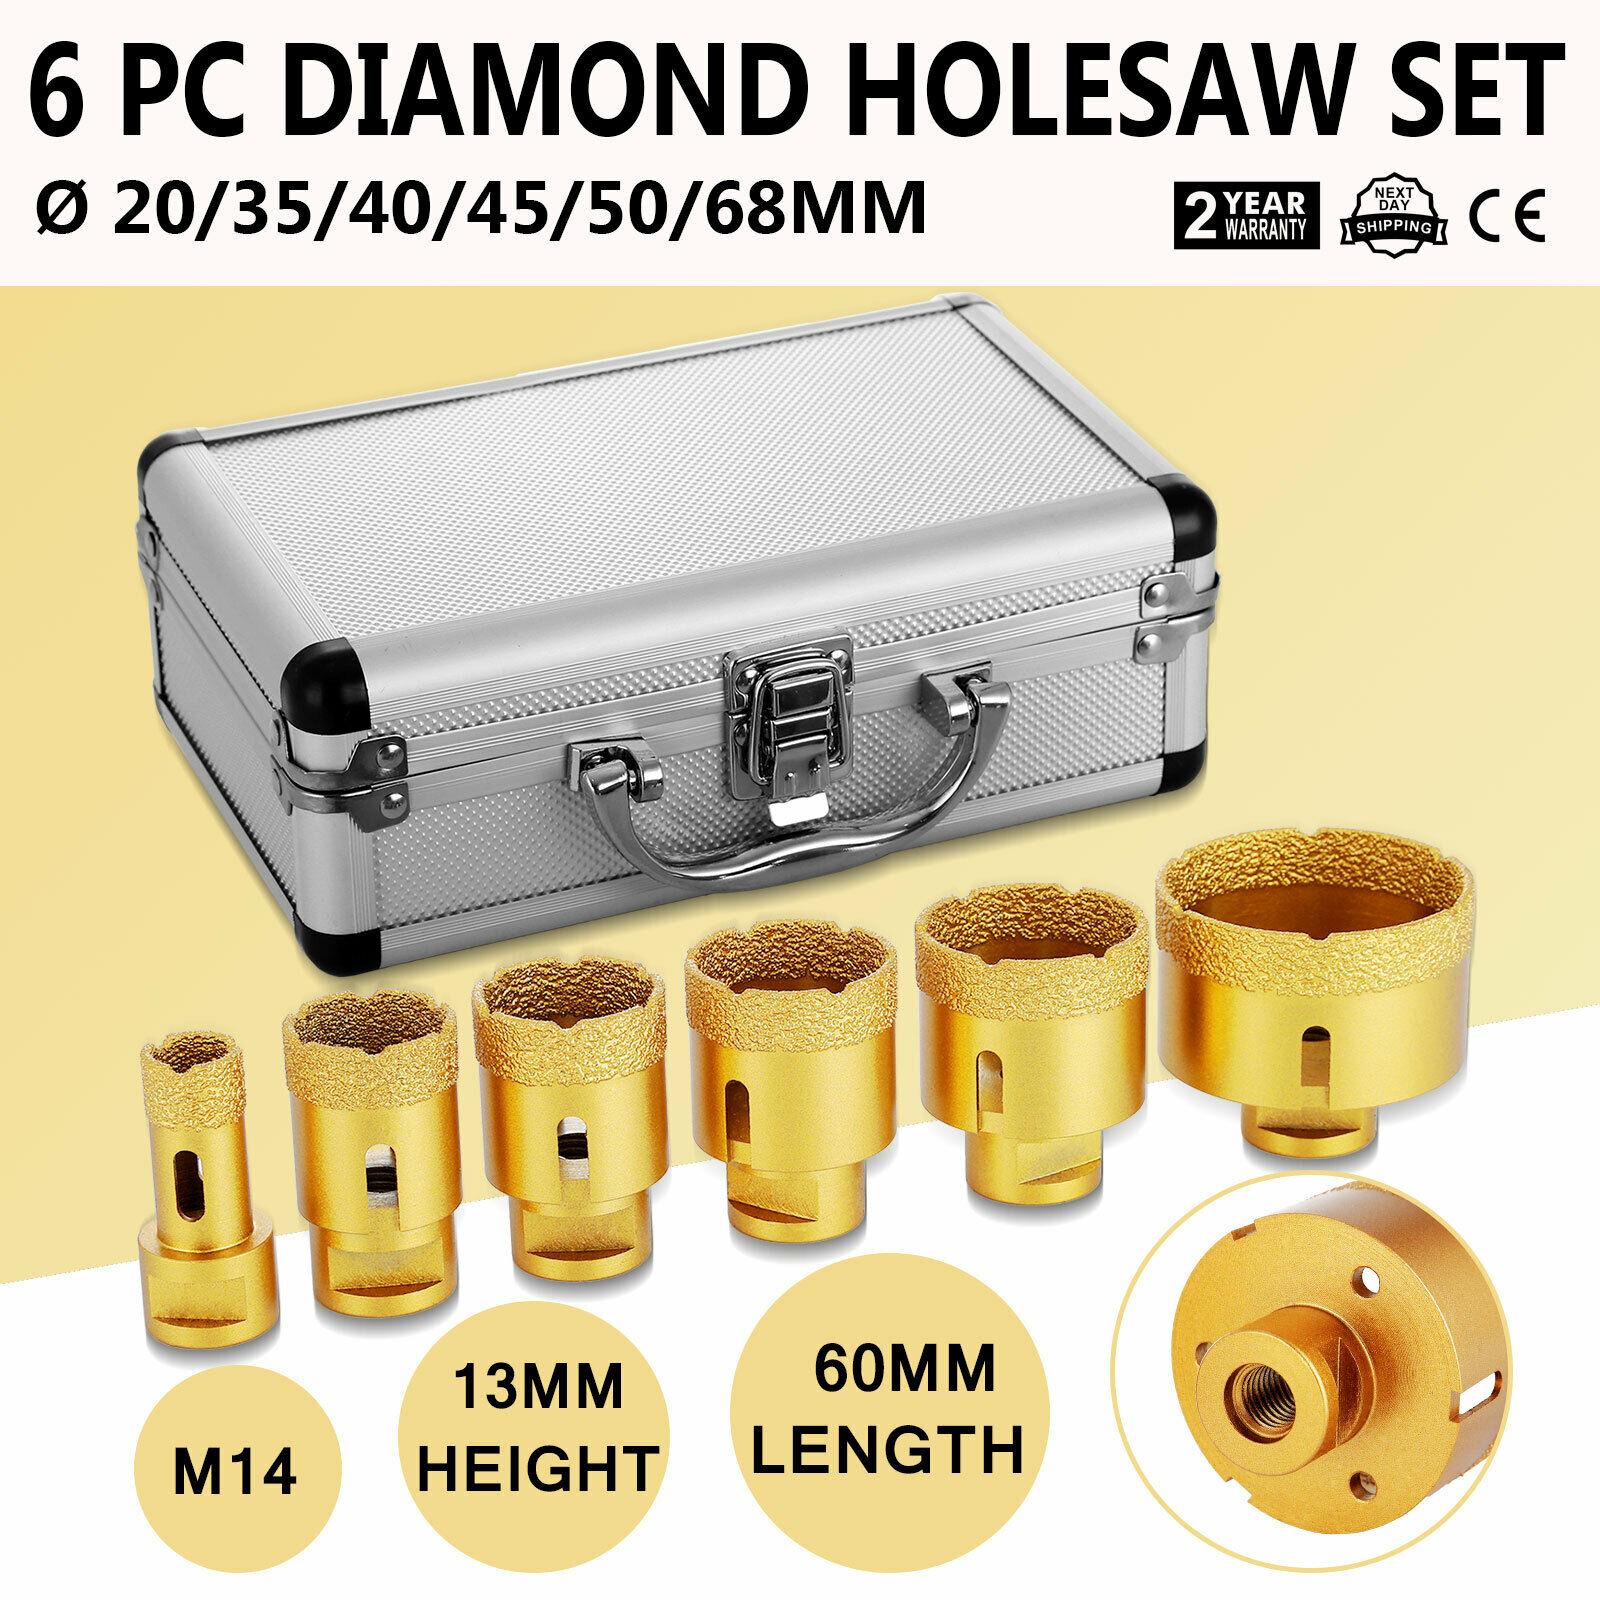 Diamond Hole Saw Set Of 6 Professional Diamond Hole Cutters Dimante Coating 0.8 1.4 1.6 1.8 2 2.7Inch